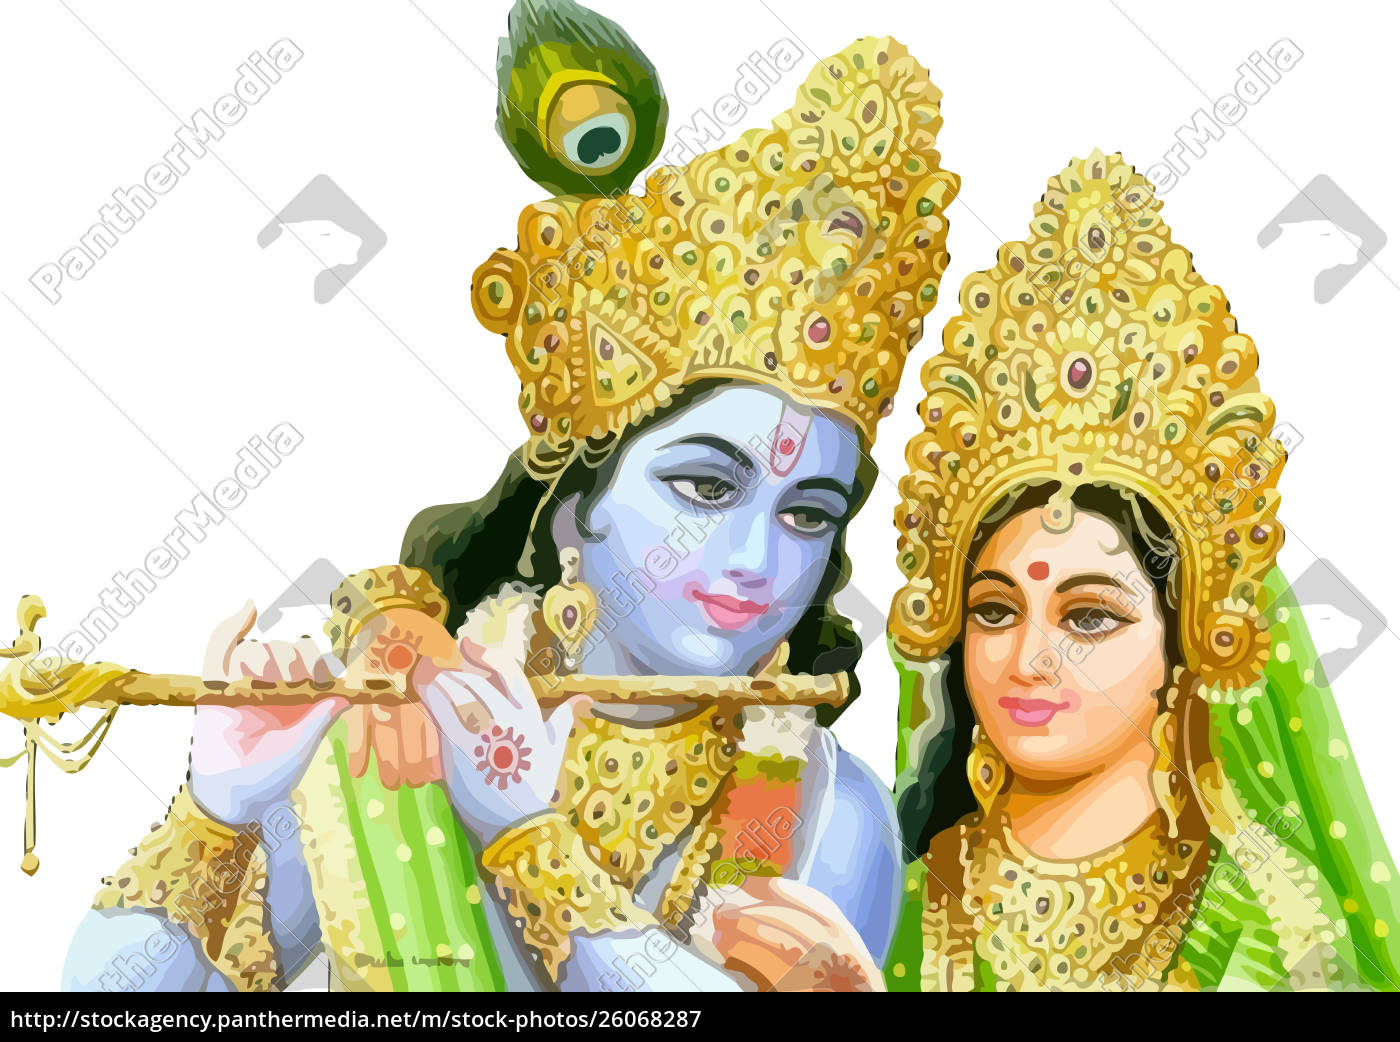 yashoda, herr, krishna, festival, hinduismus, kultur - 26068287